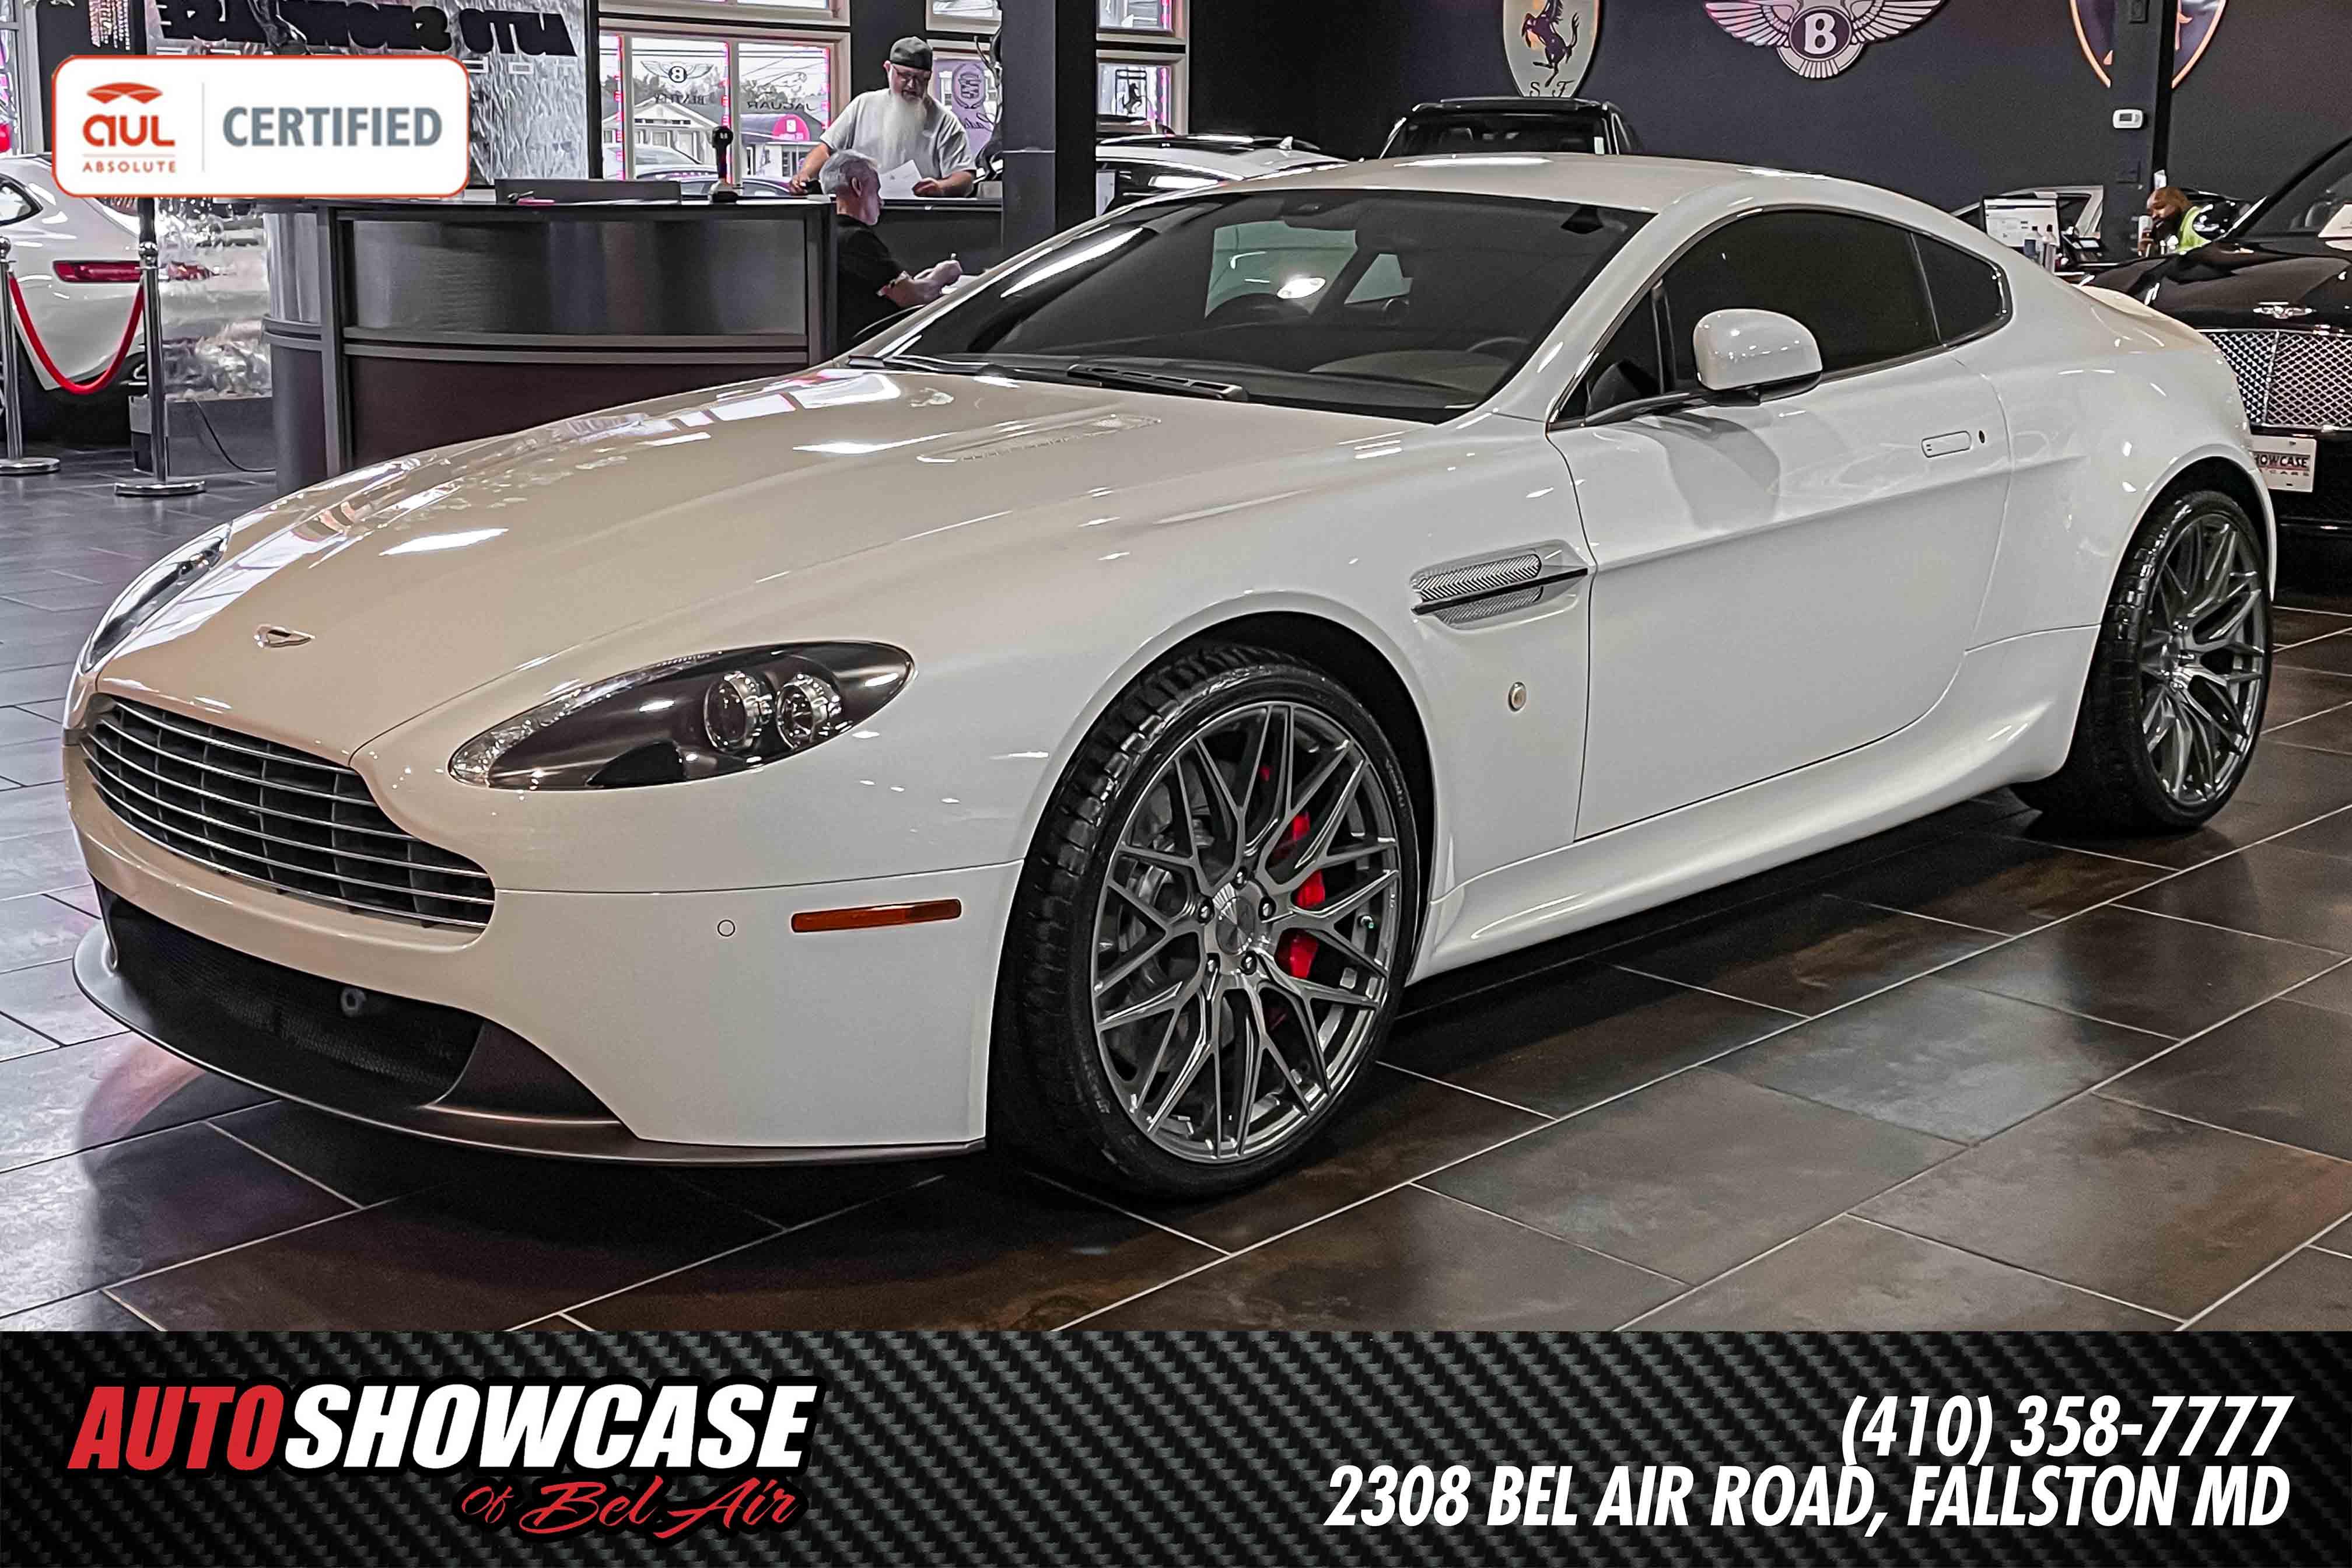 Used 2014 Aston Martin V8 Vantage For Sale At Auto Showcase Of Bel Air Vin Scfekbak9egc18629